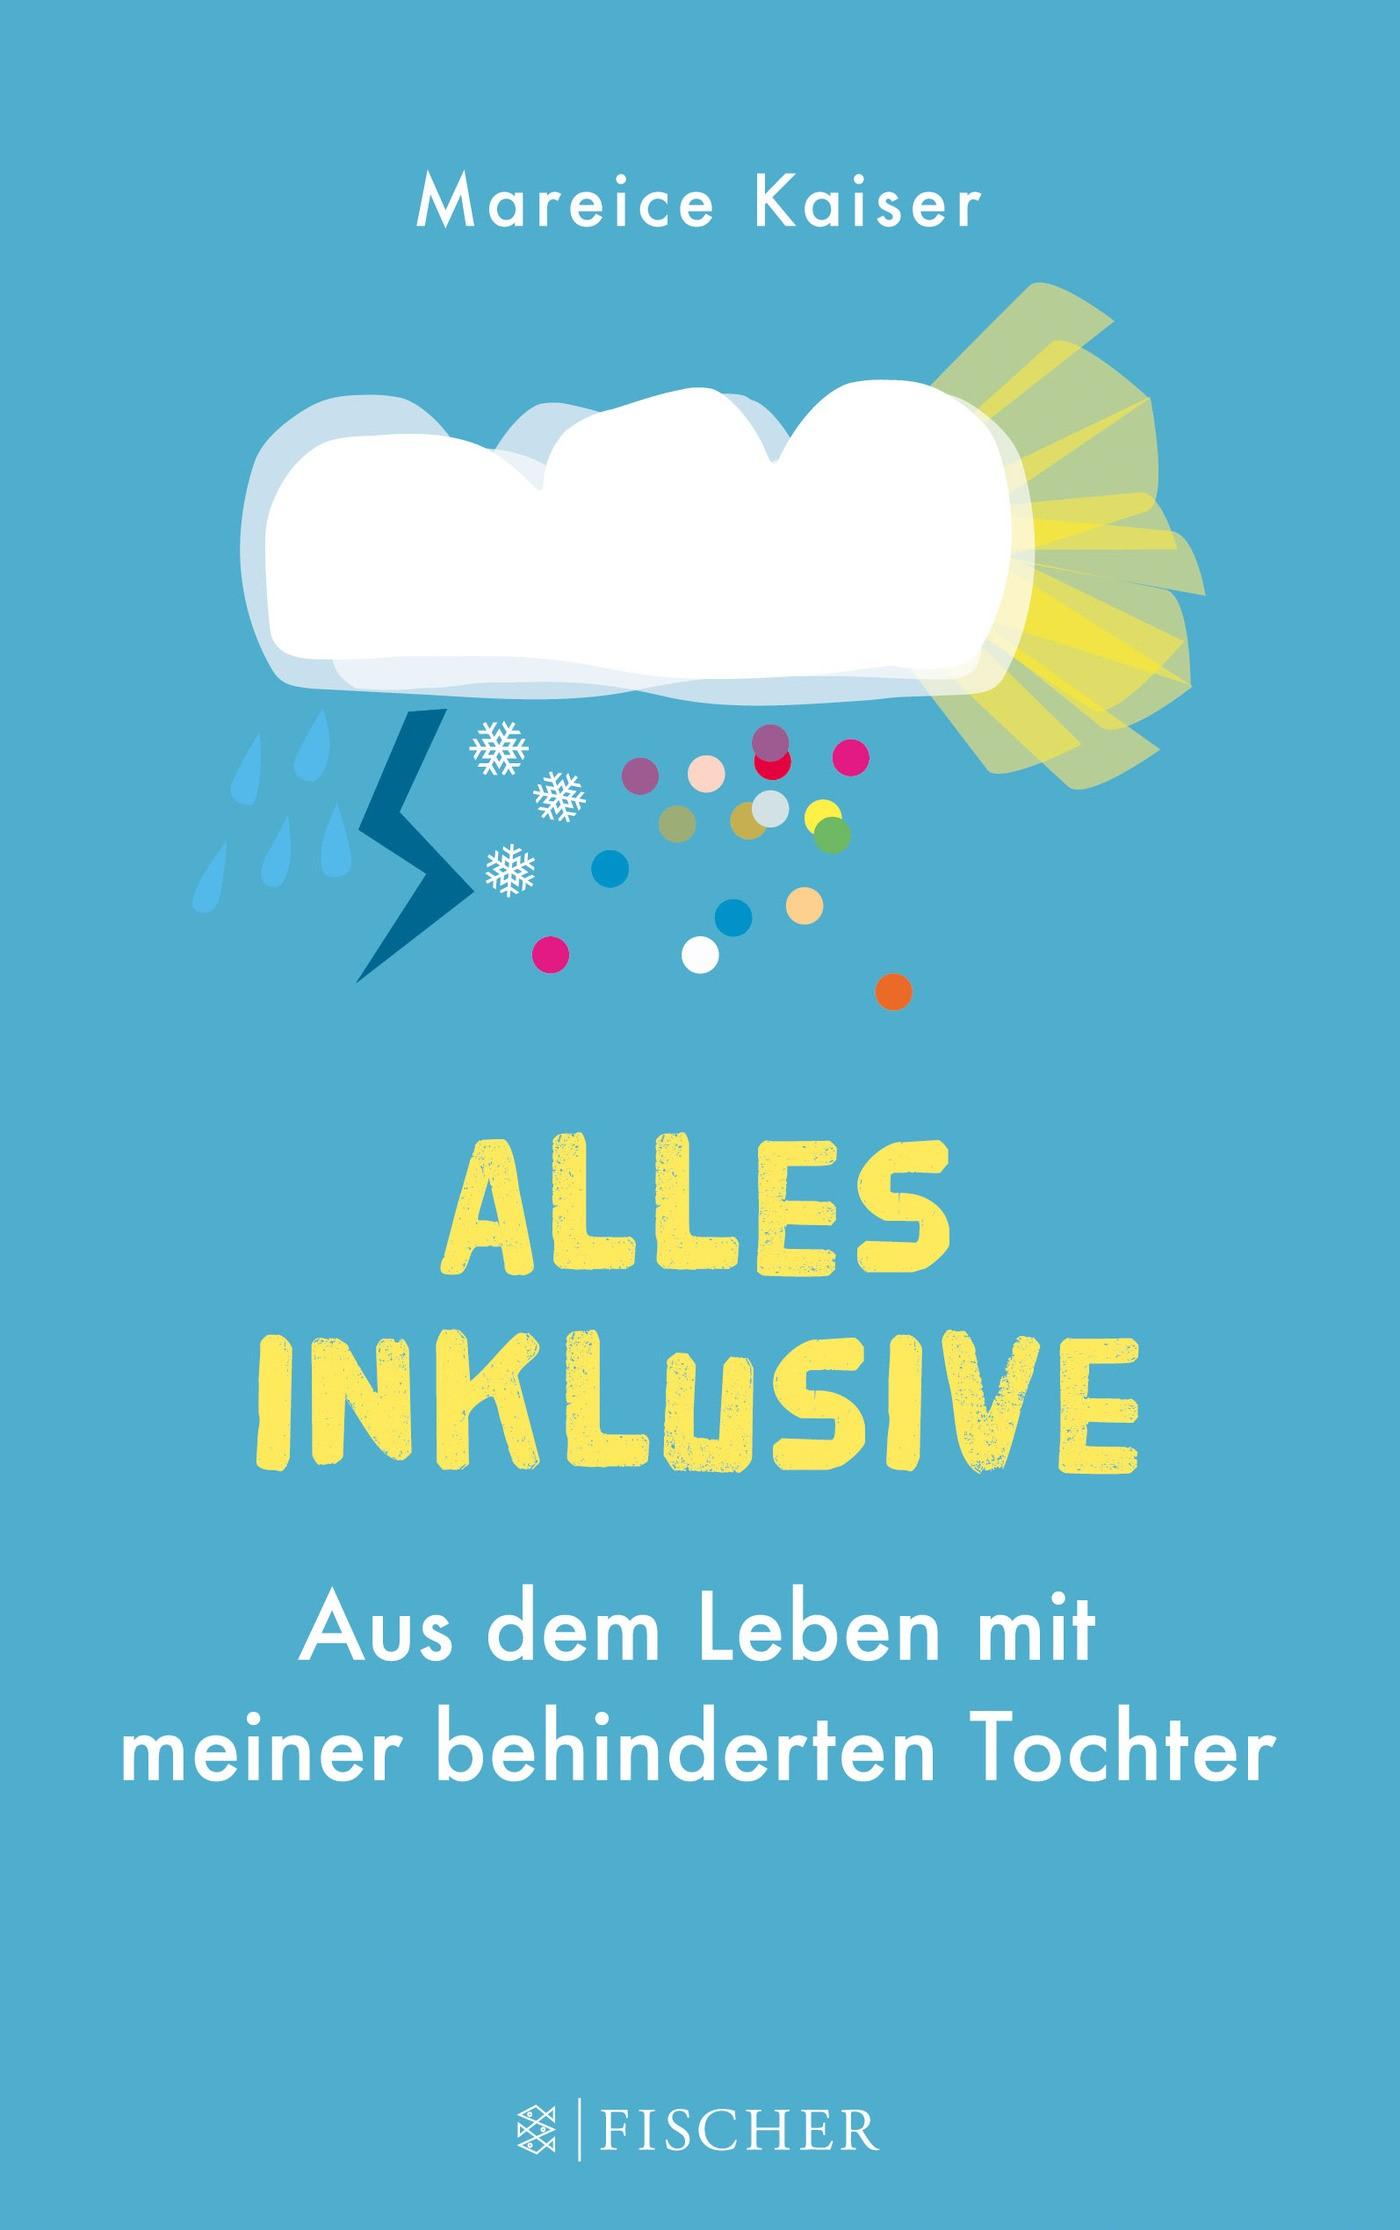 Alles inklusive | Kaiser, 2016 | Buch (Cover)